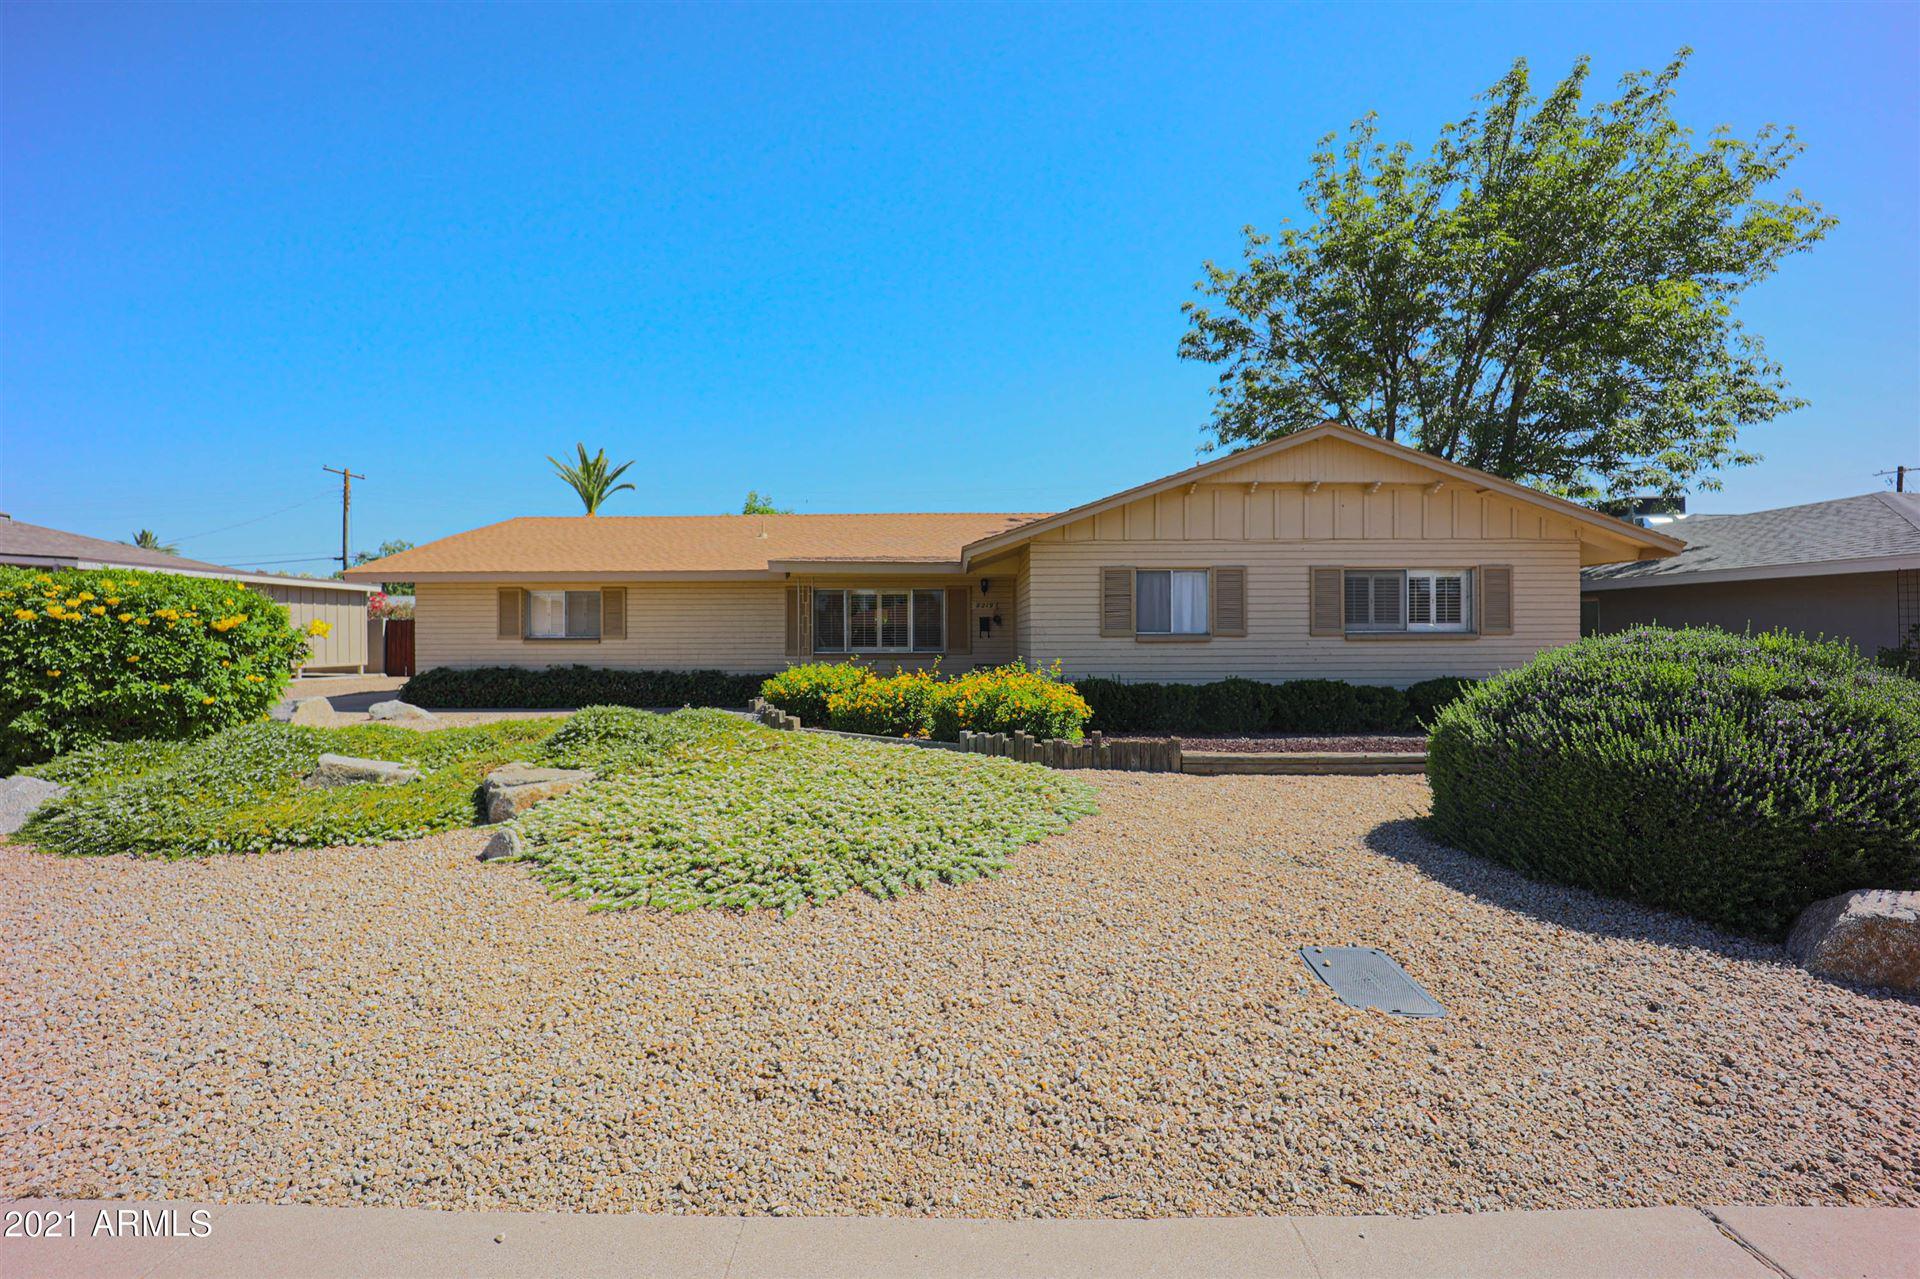 8219 E Rancho Vista Drive, Scottsdale, AZ 85251 - MLS#: 6235699